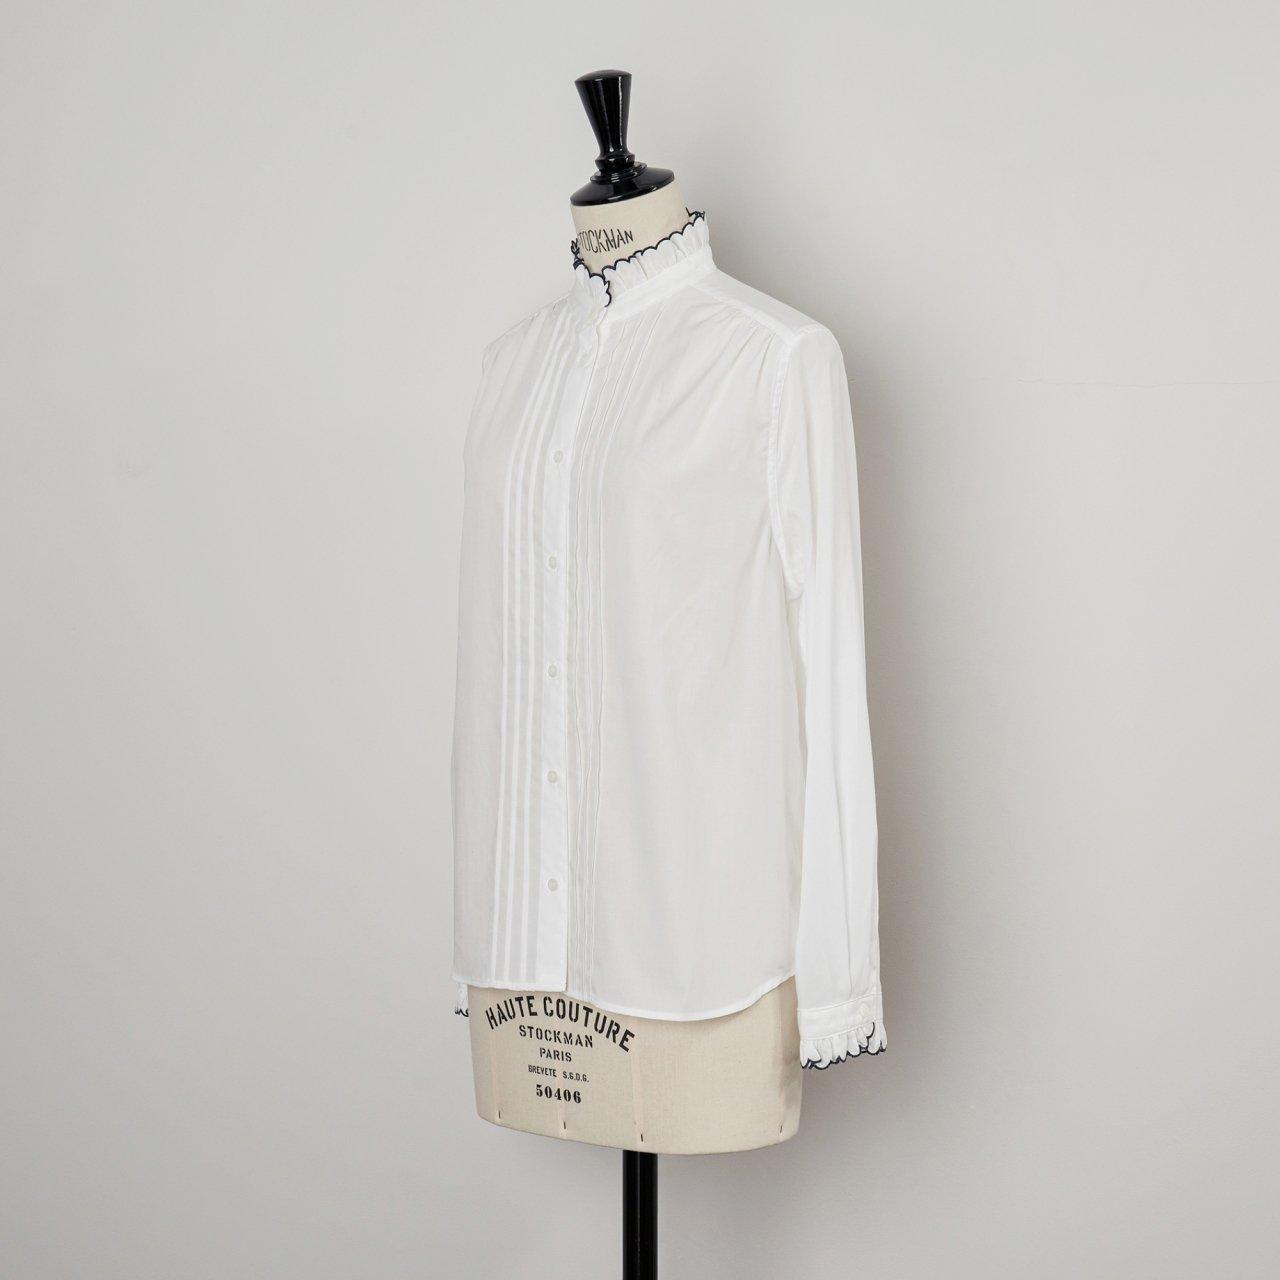 SINME<BR>スカラエンブロイダリーシャツ<BR>ホワイト×ネイビー